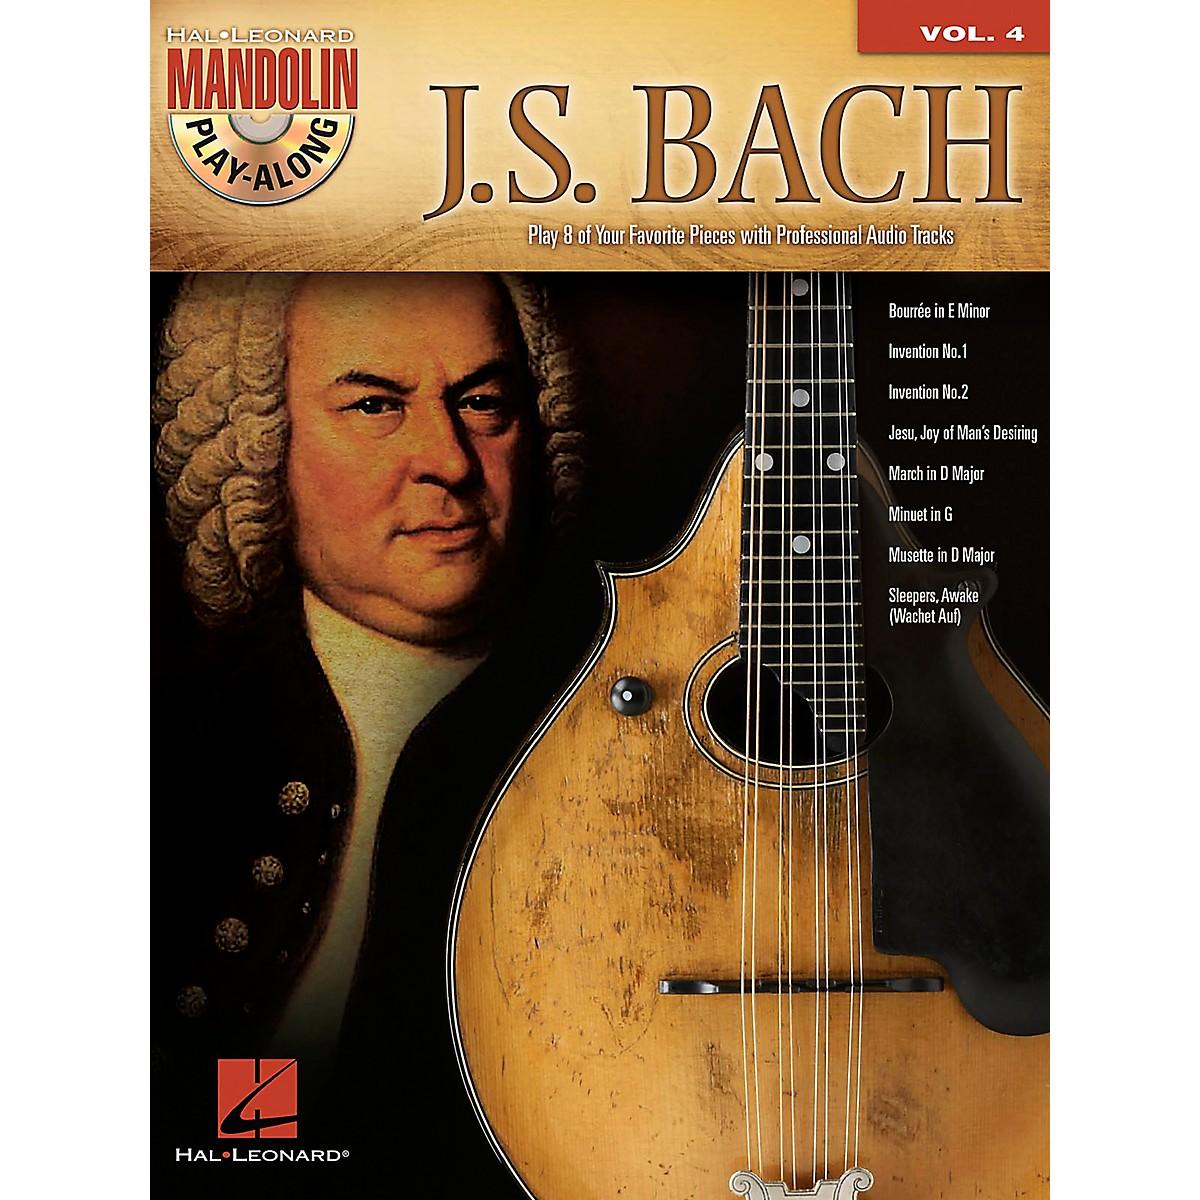 Hal Leonard J.S. Bach - Mandolin Play-Along Vol. 4 Book/CD